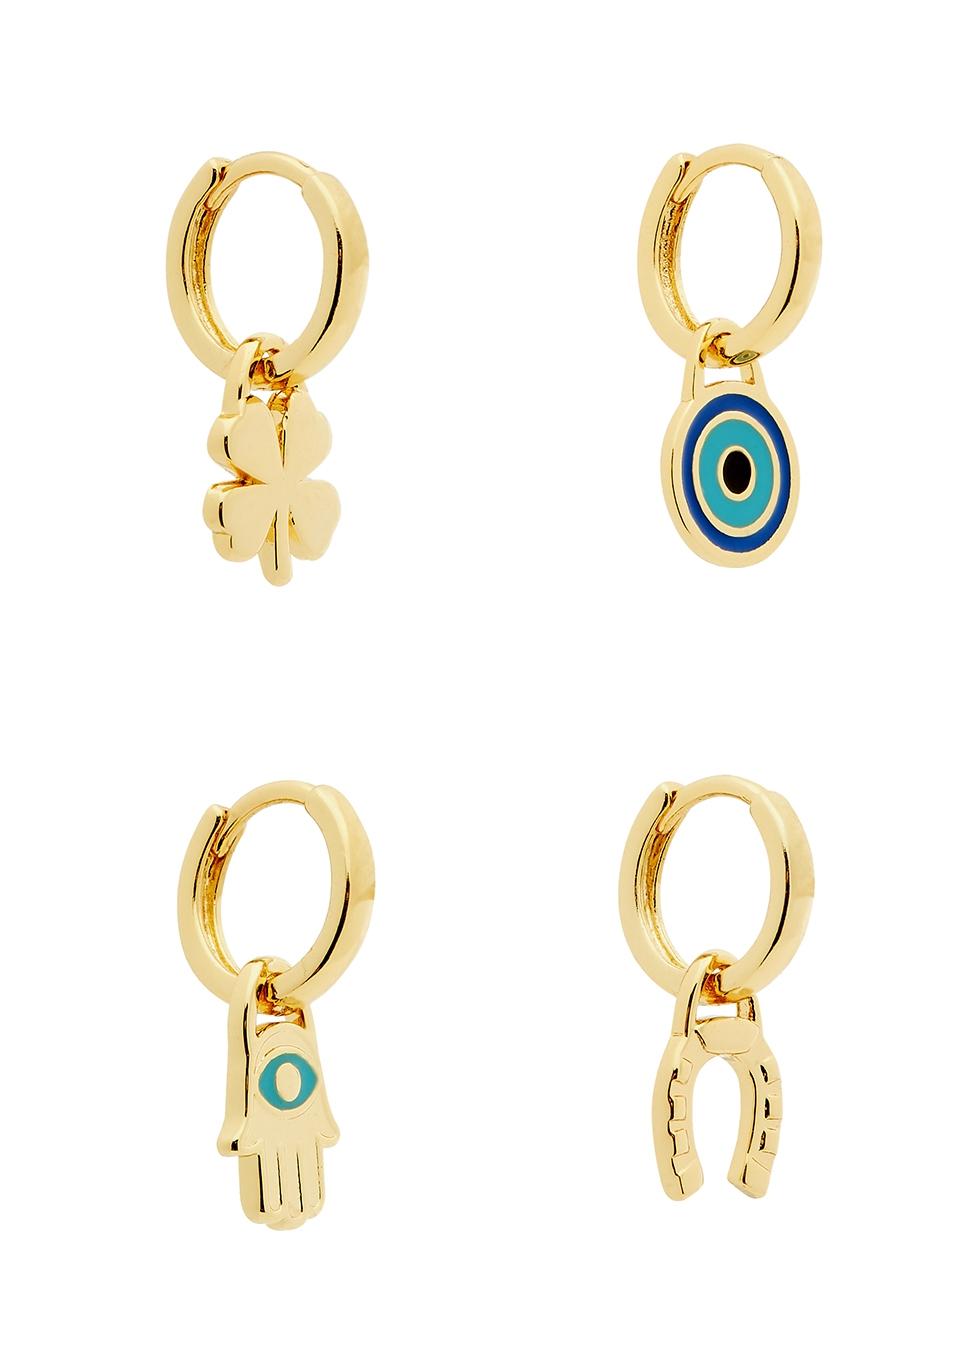 Fortuna 14kt gold-dipped hoop earrings